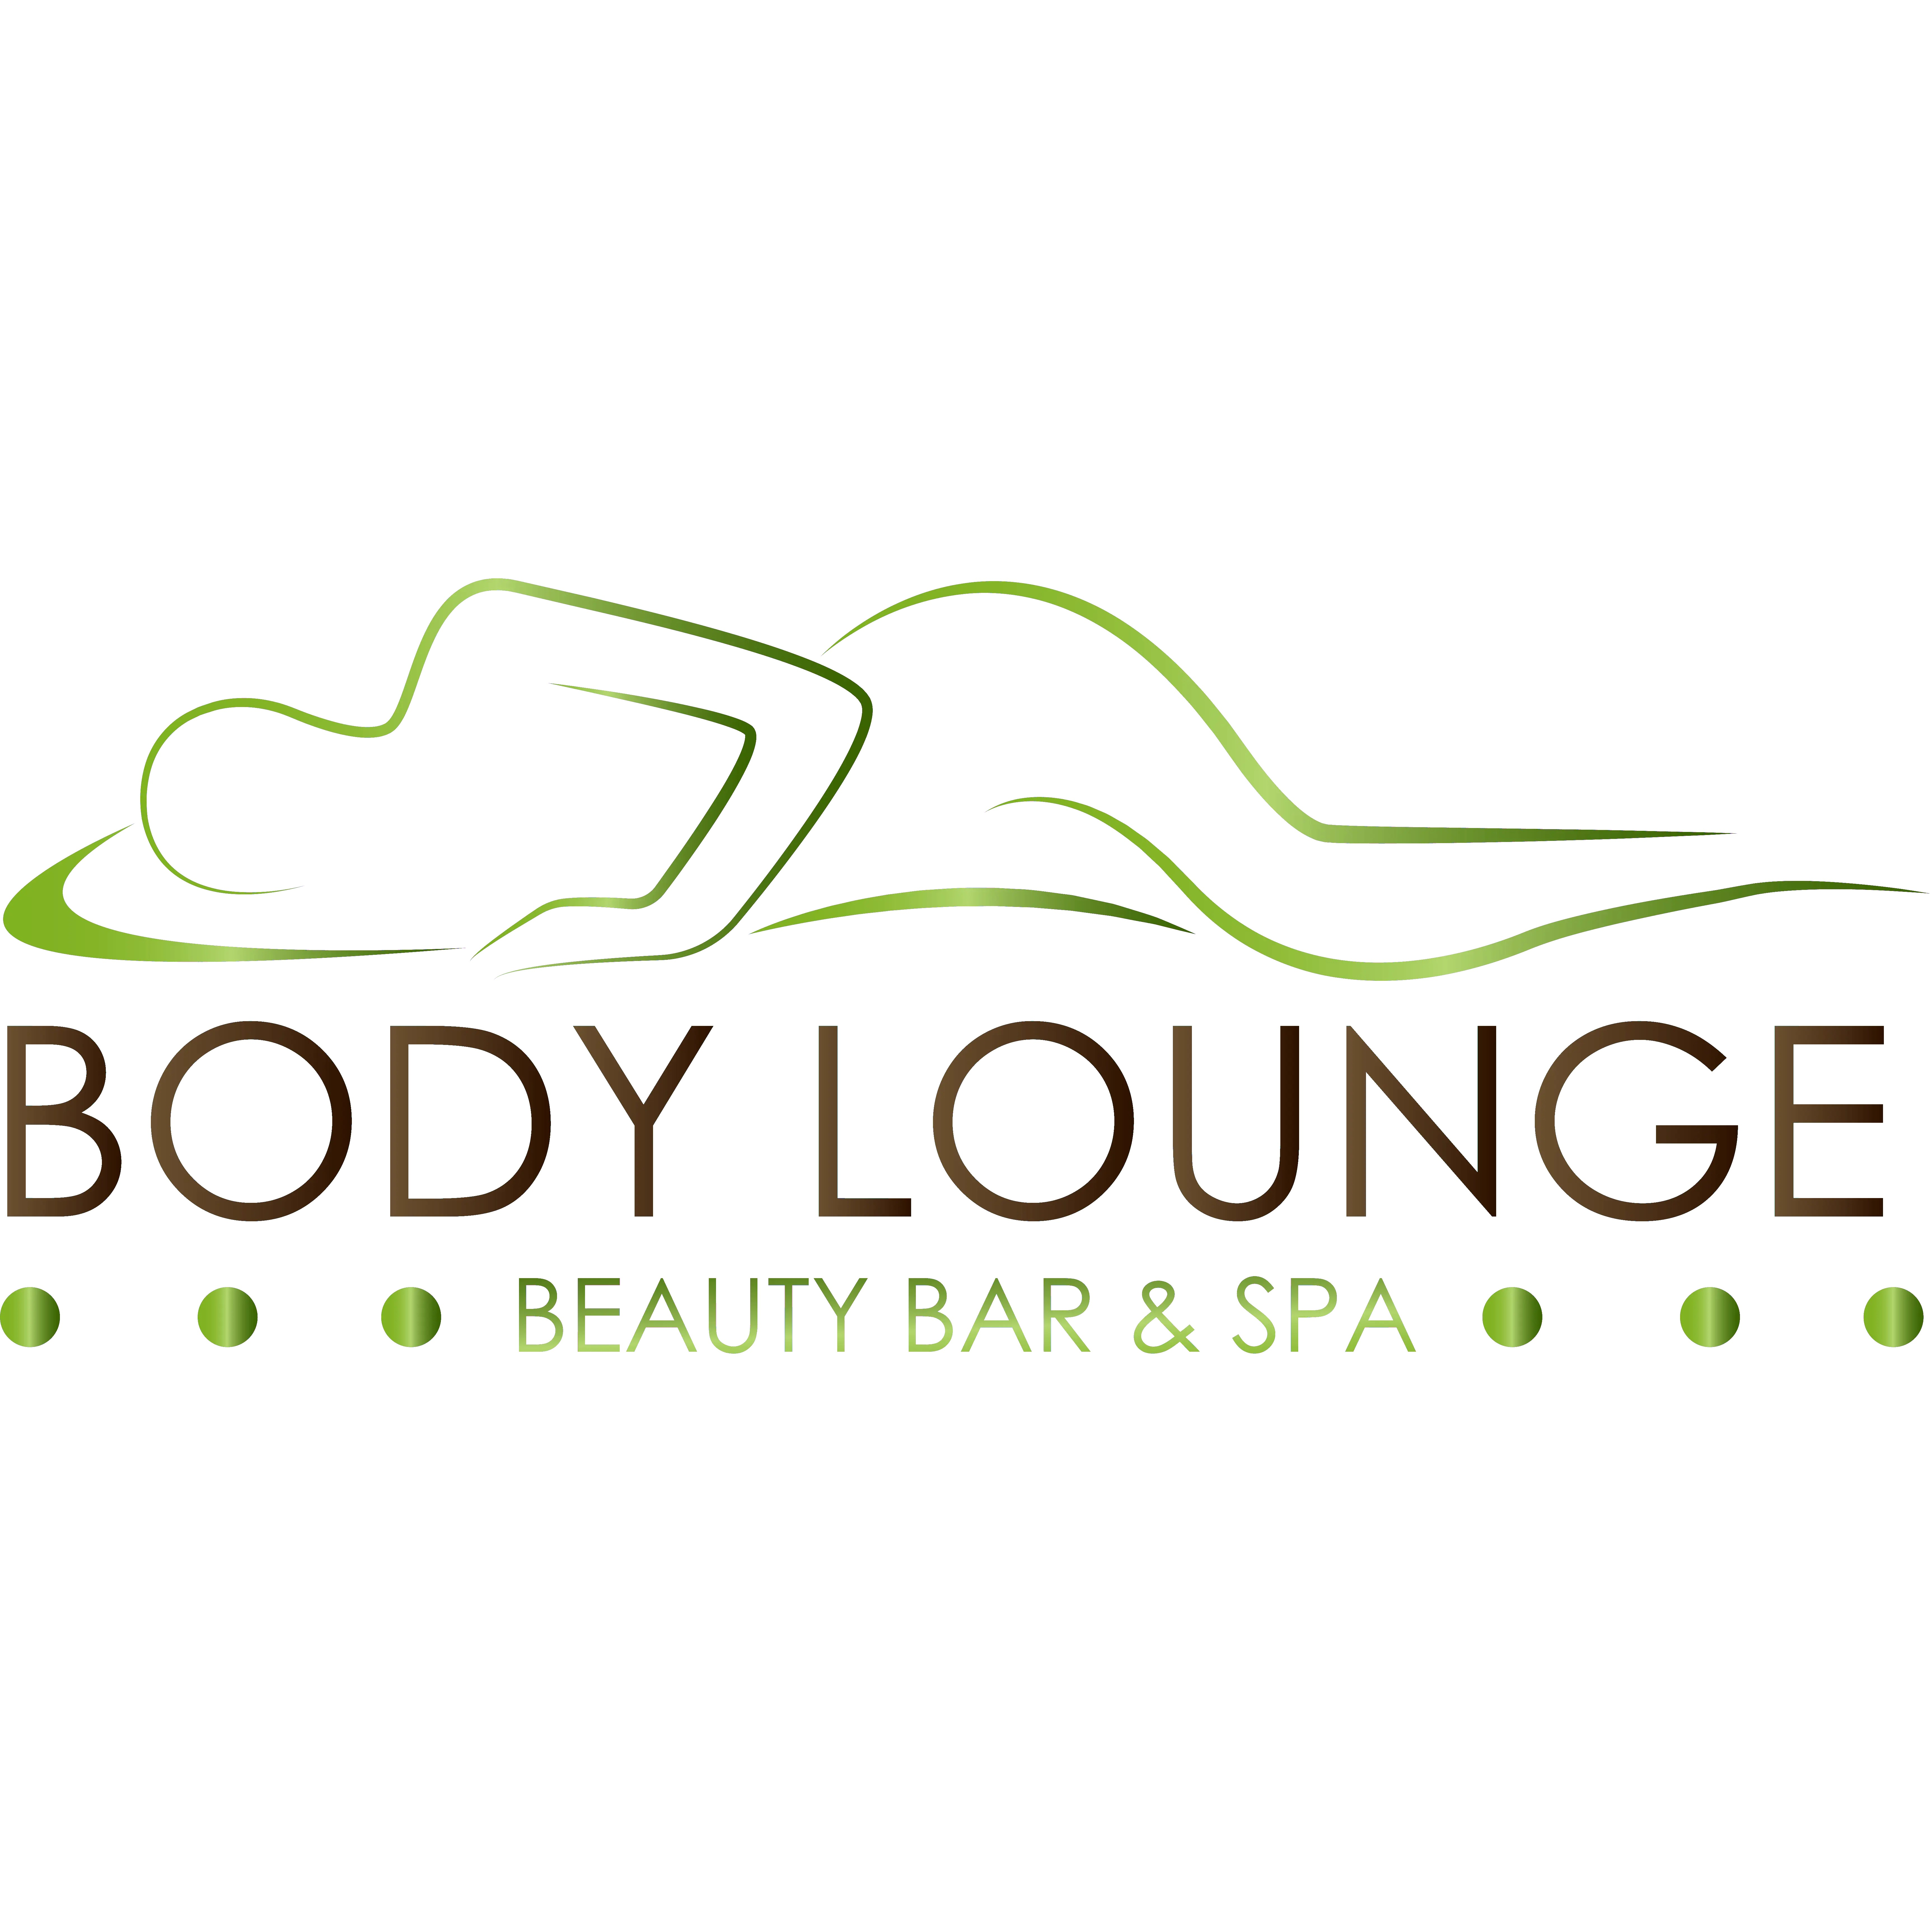 Body Lounge Beauty Bar & Spa